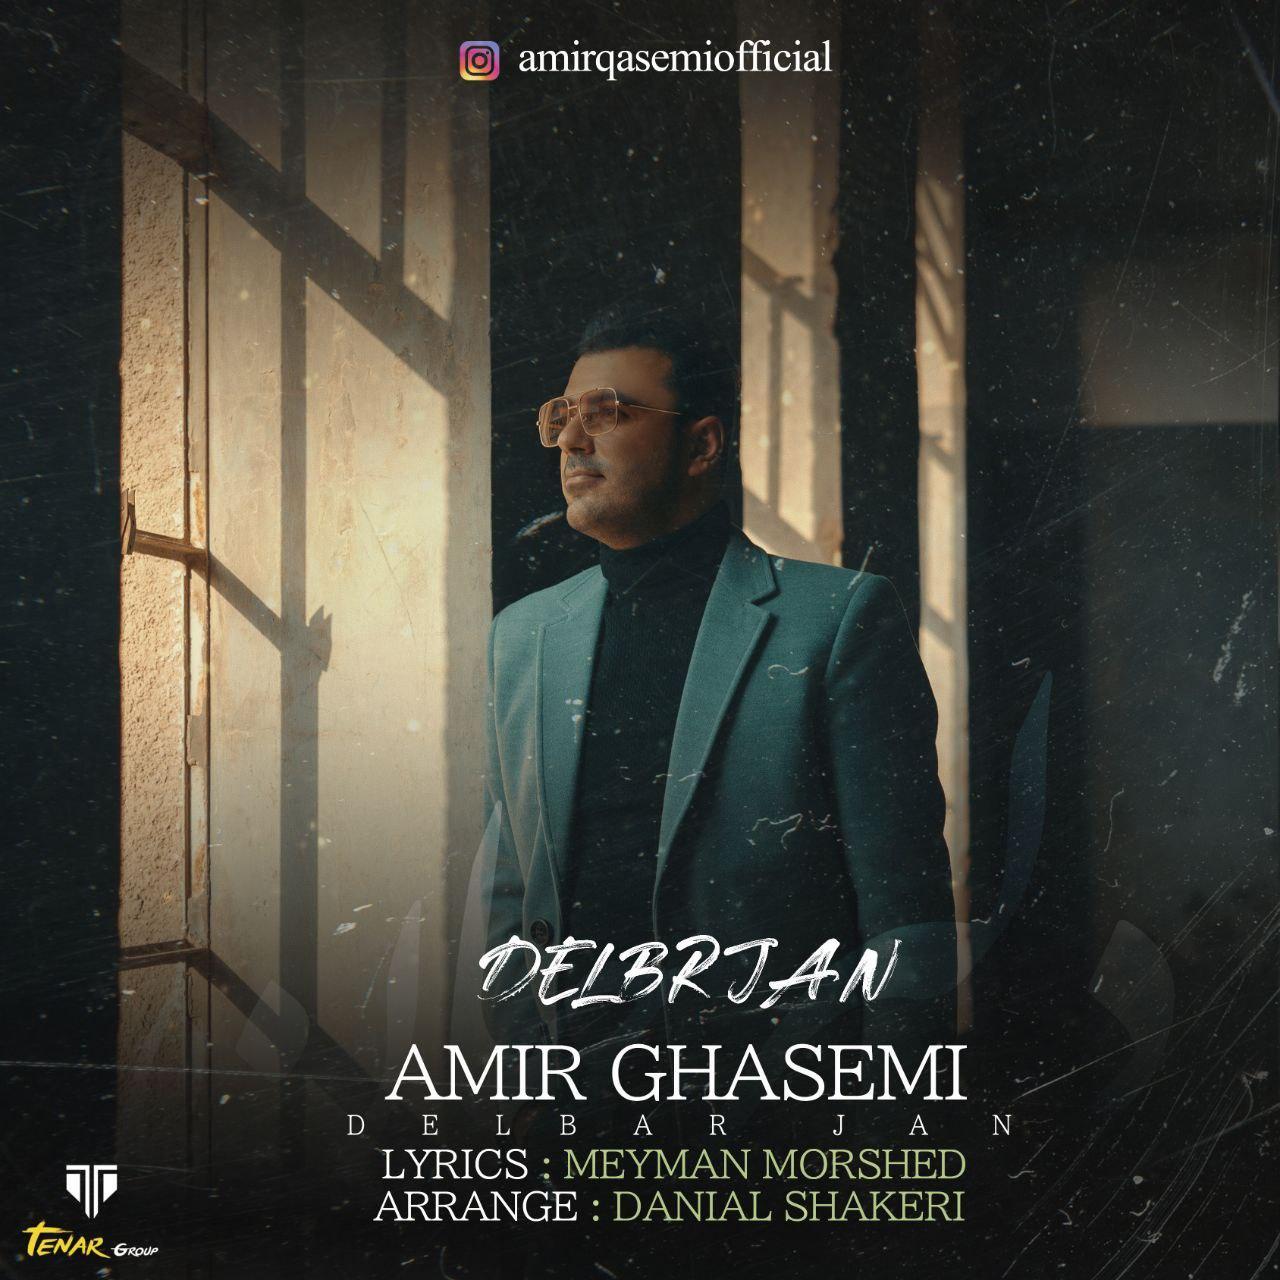 Amir Ghasemi – Delbar Jan